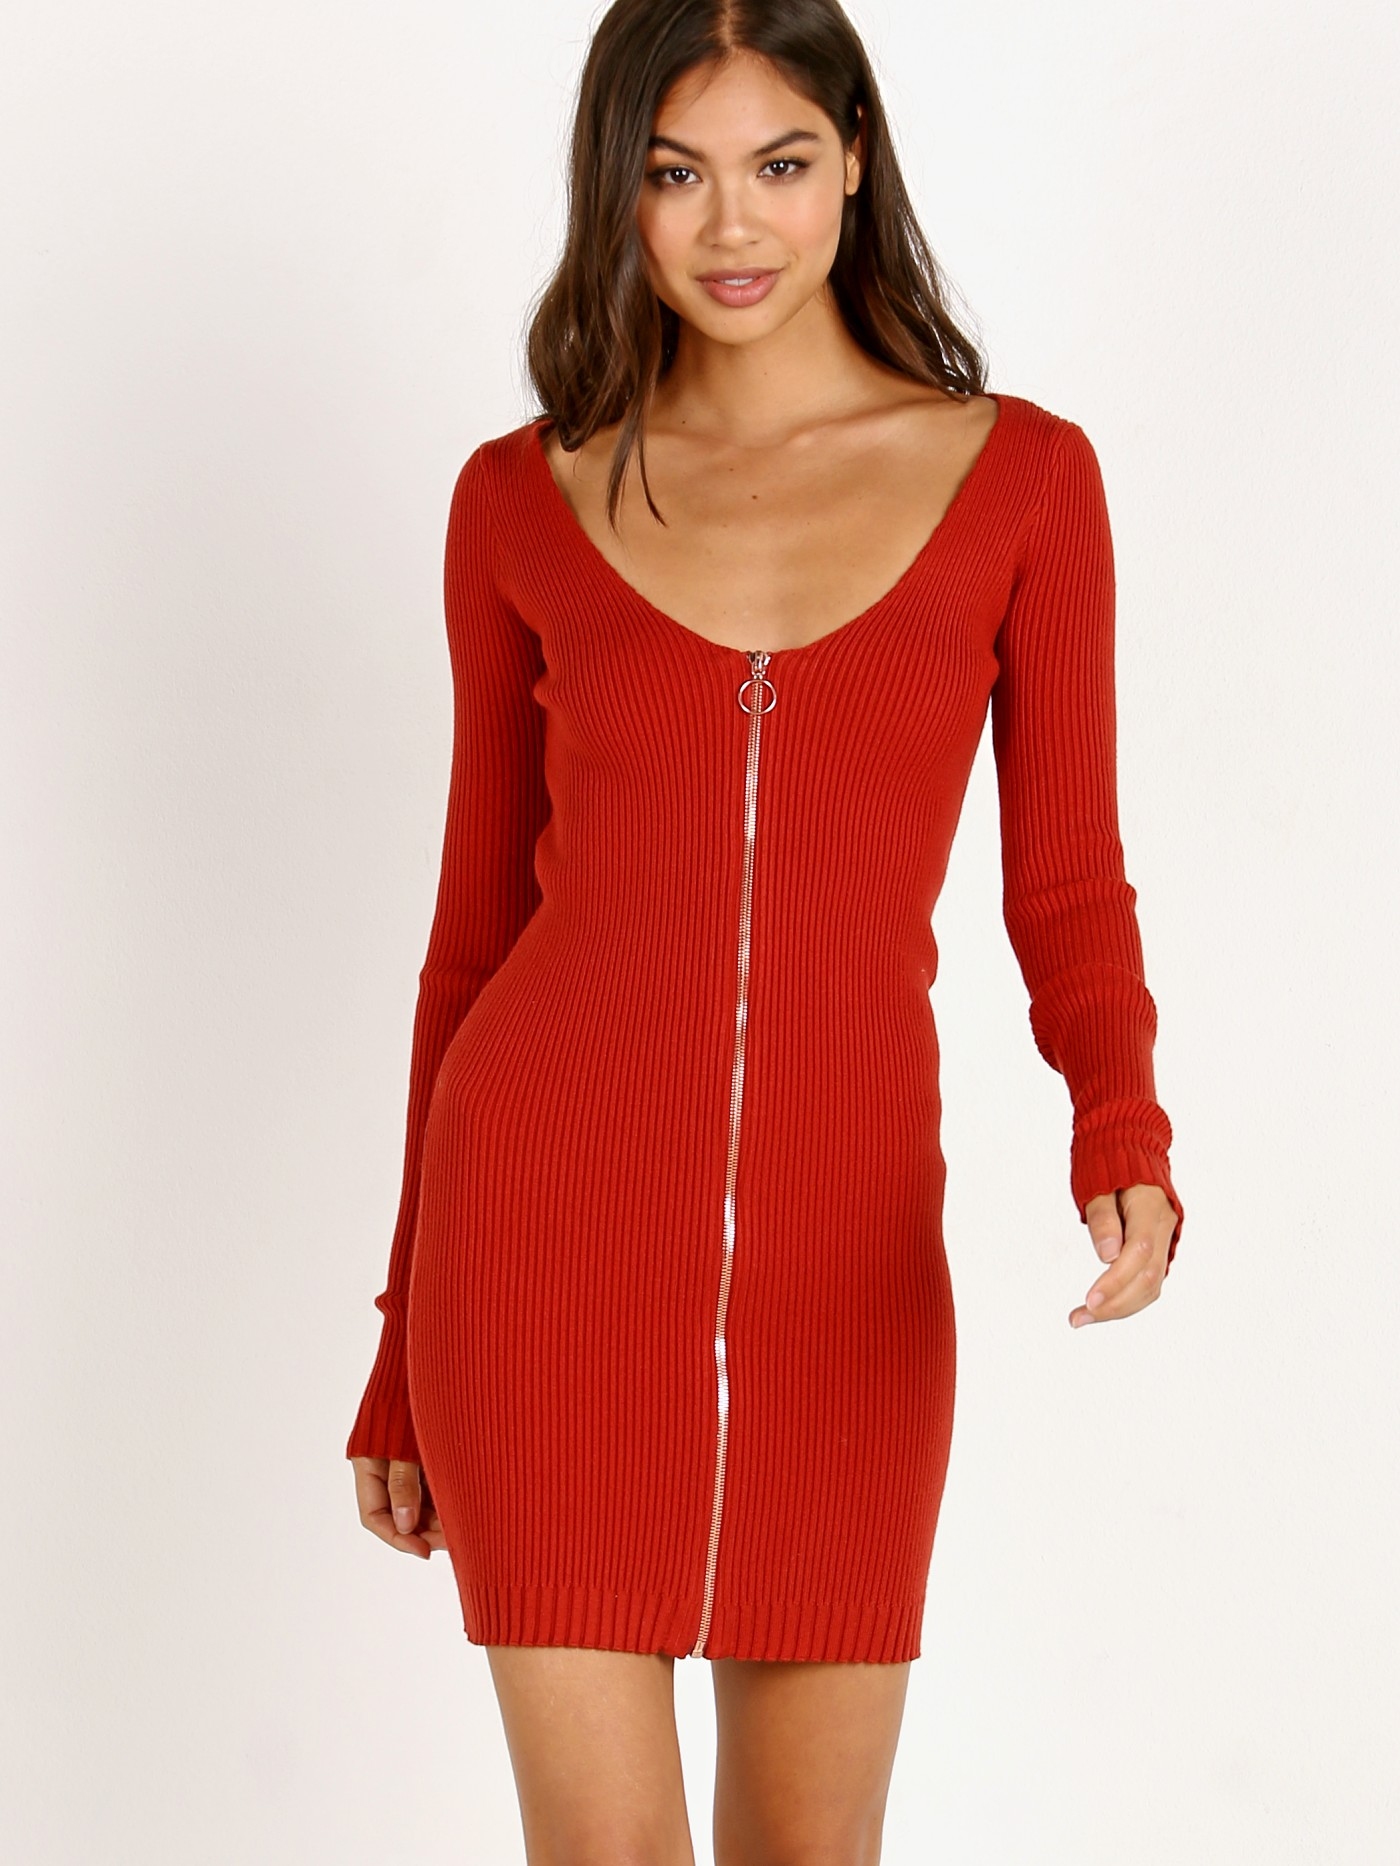 00409e52faba4 For Love & Lemons Knitz Annie Zipper Mini Dress Rust KFA18D403-FA18 - Free  Shipping at Largo Drive